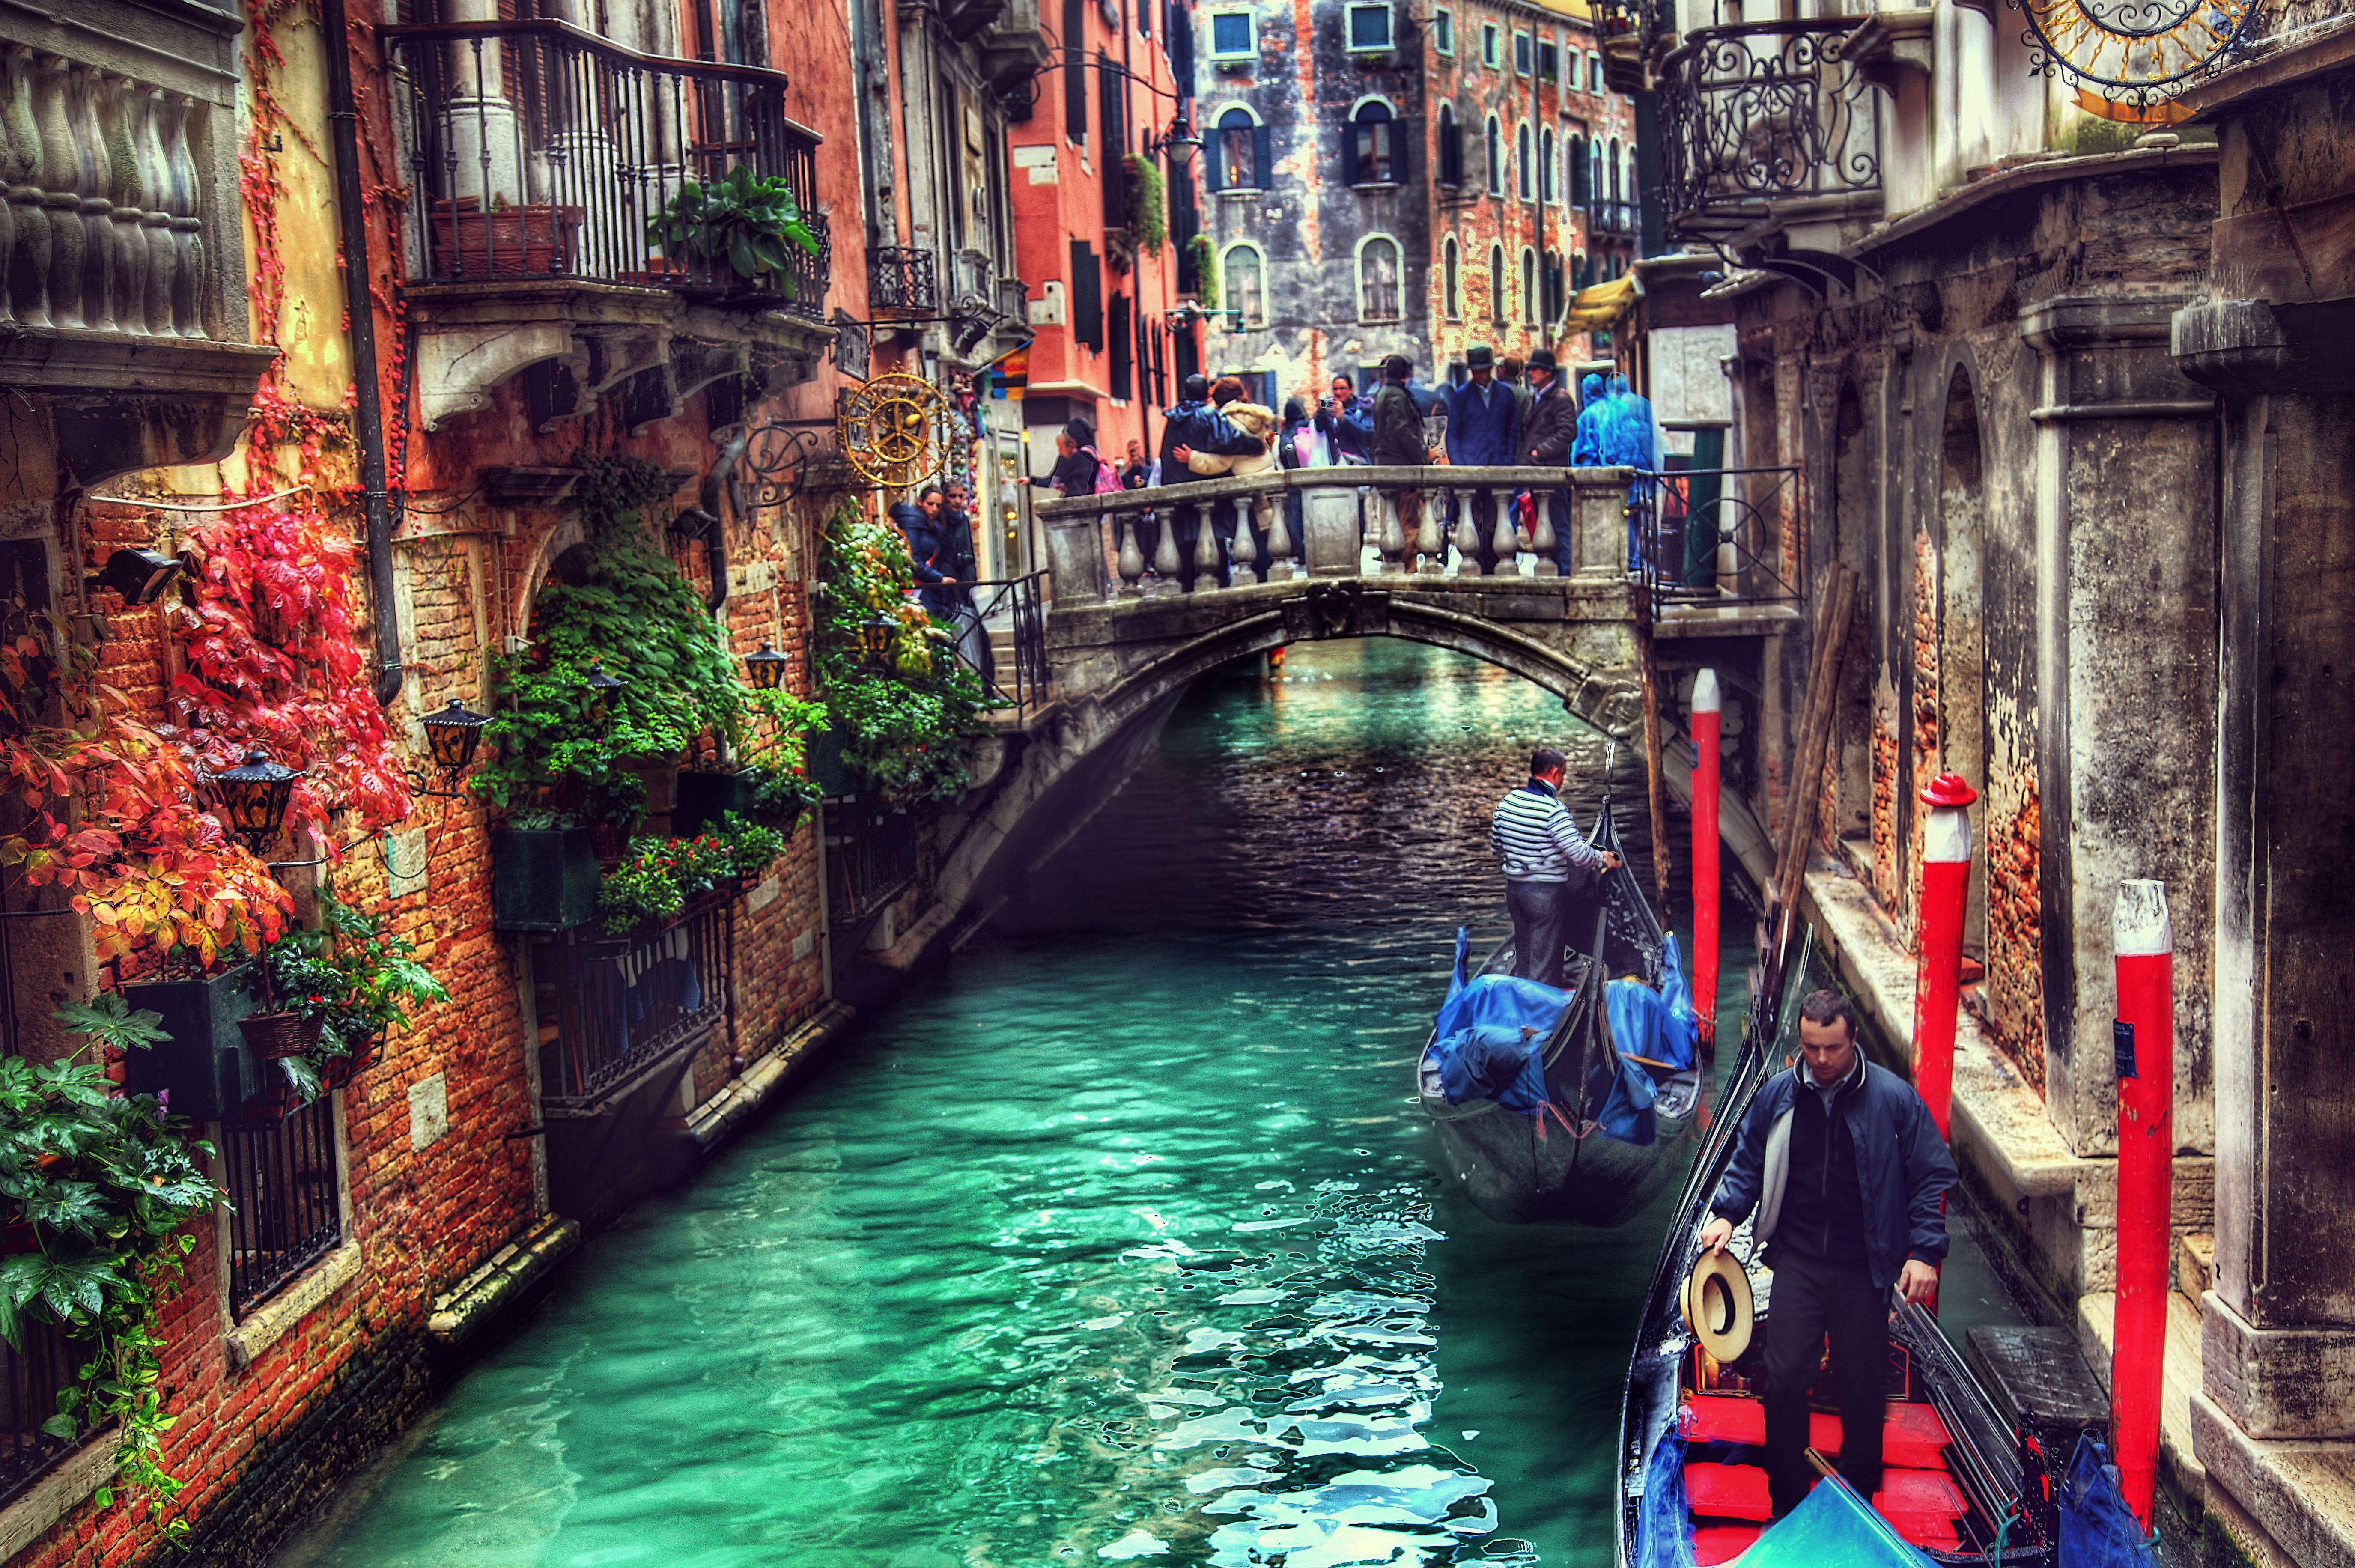 Venice Wallpapers Hd